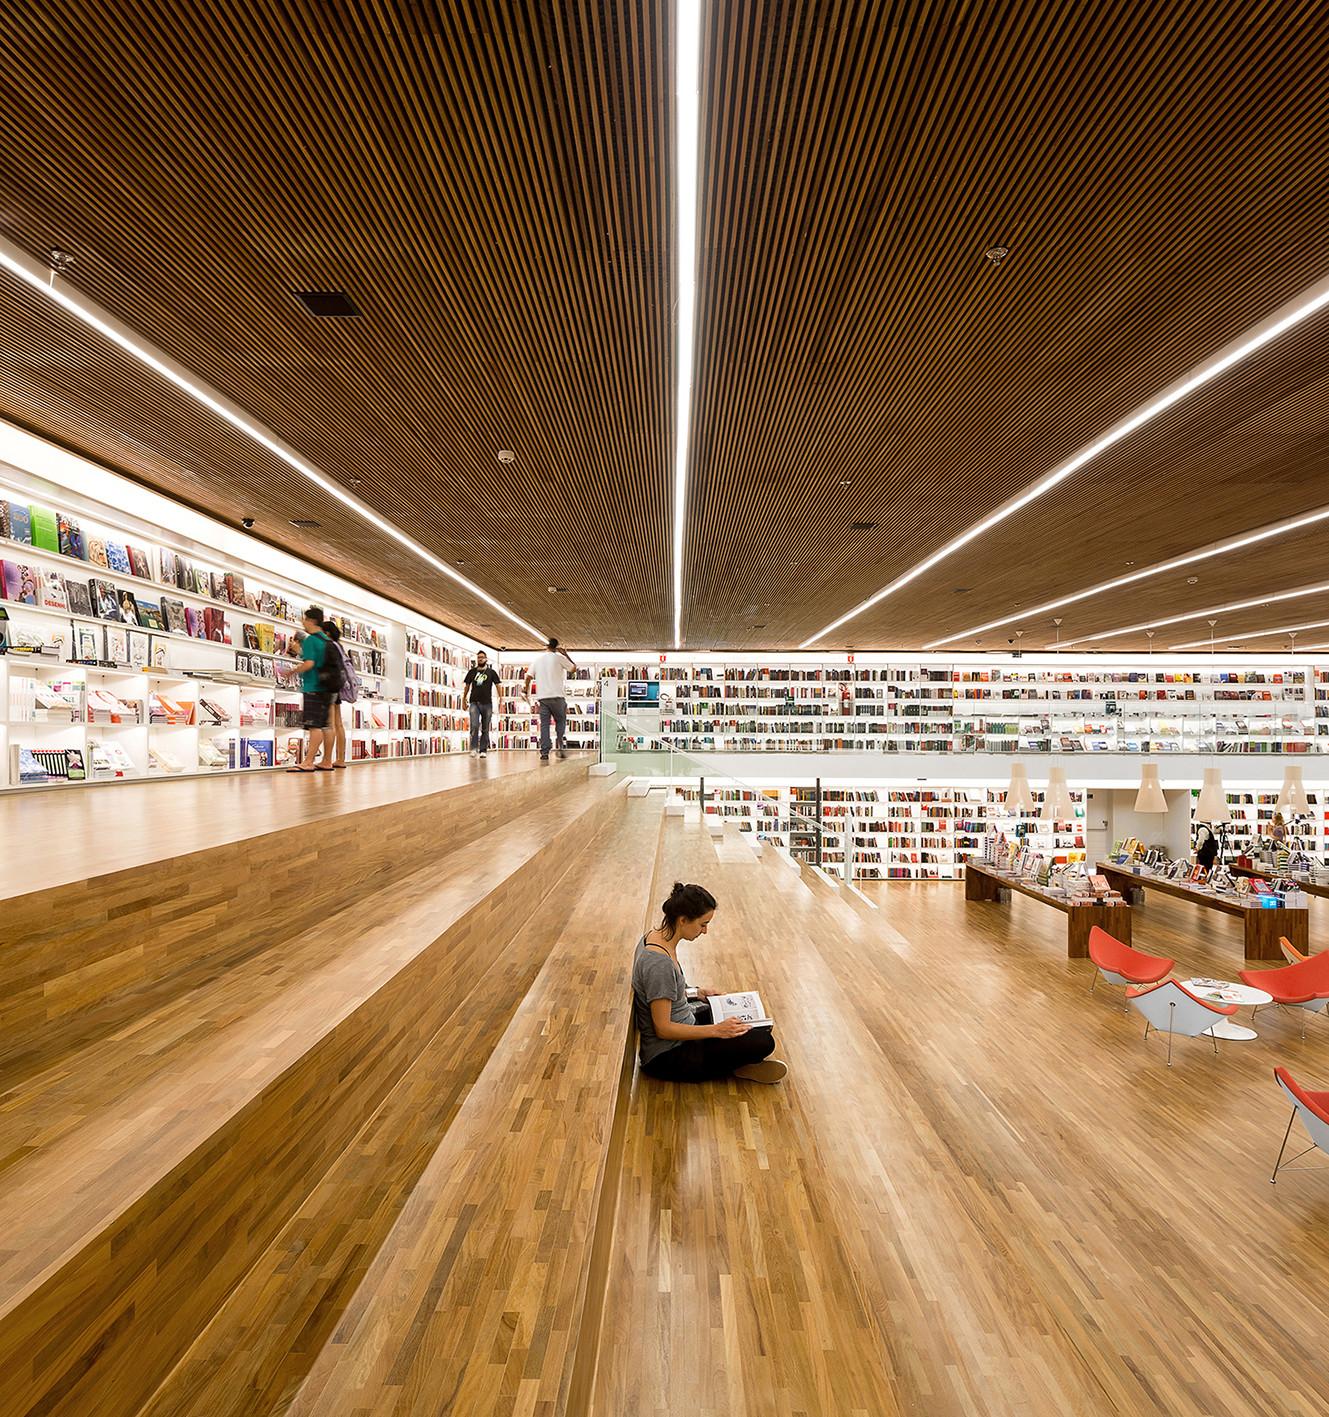 Cultura Bookstore - Studio MK27 – Marcio Kogan + Diana Radomysler + Luciana Antunes + Marcio Tanaka + Mariana Ruzante © Fernando Guerra FG+SG